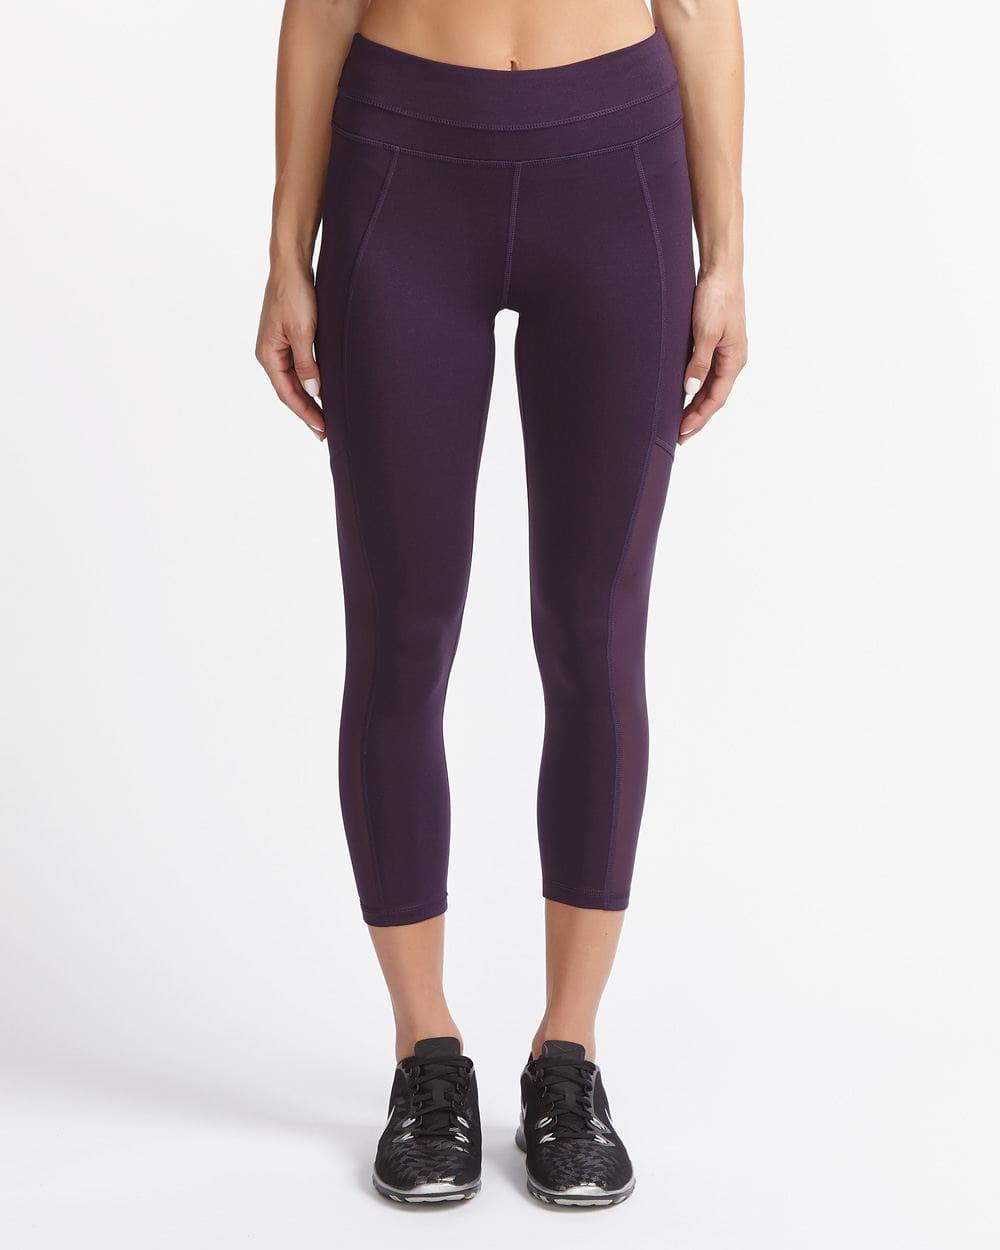 Hyba Mesh Yoga Capri Legging